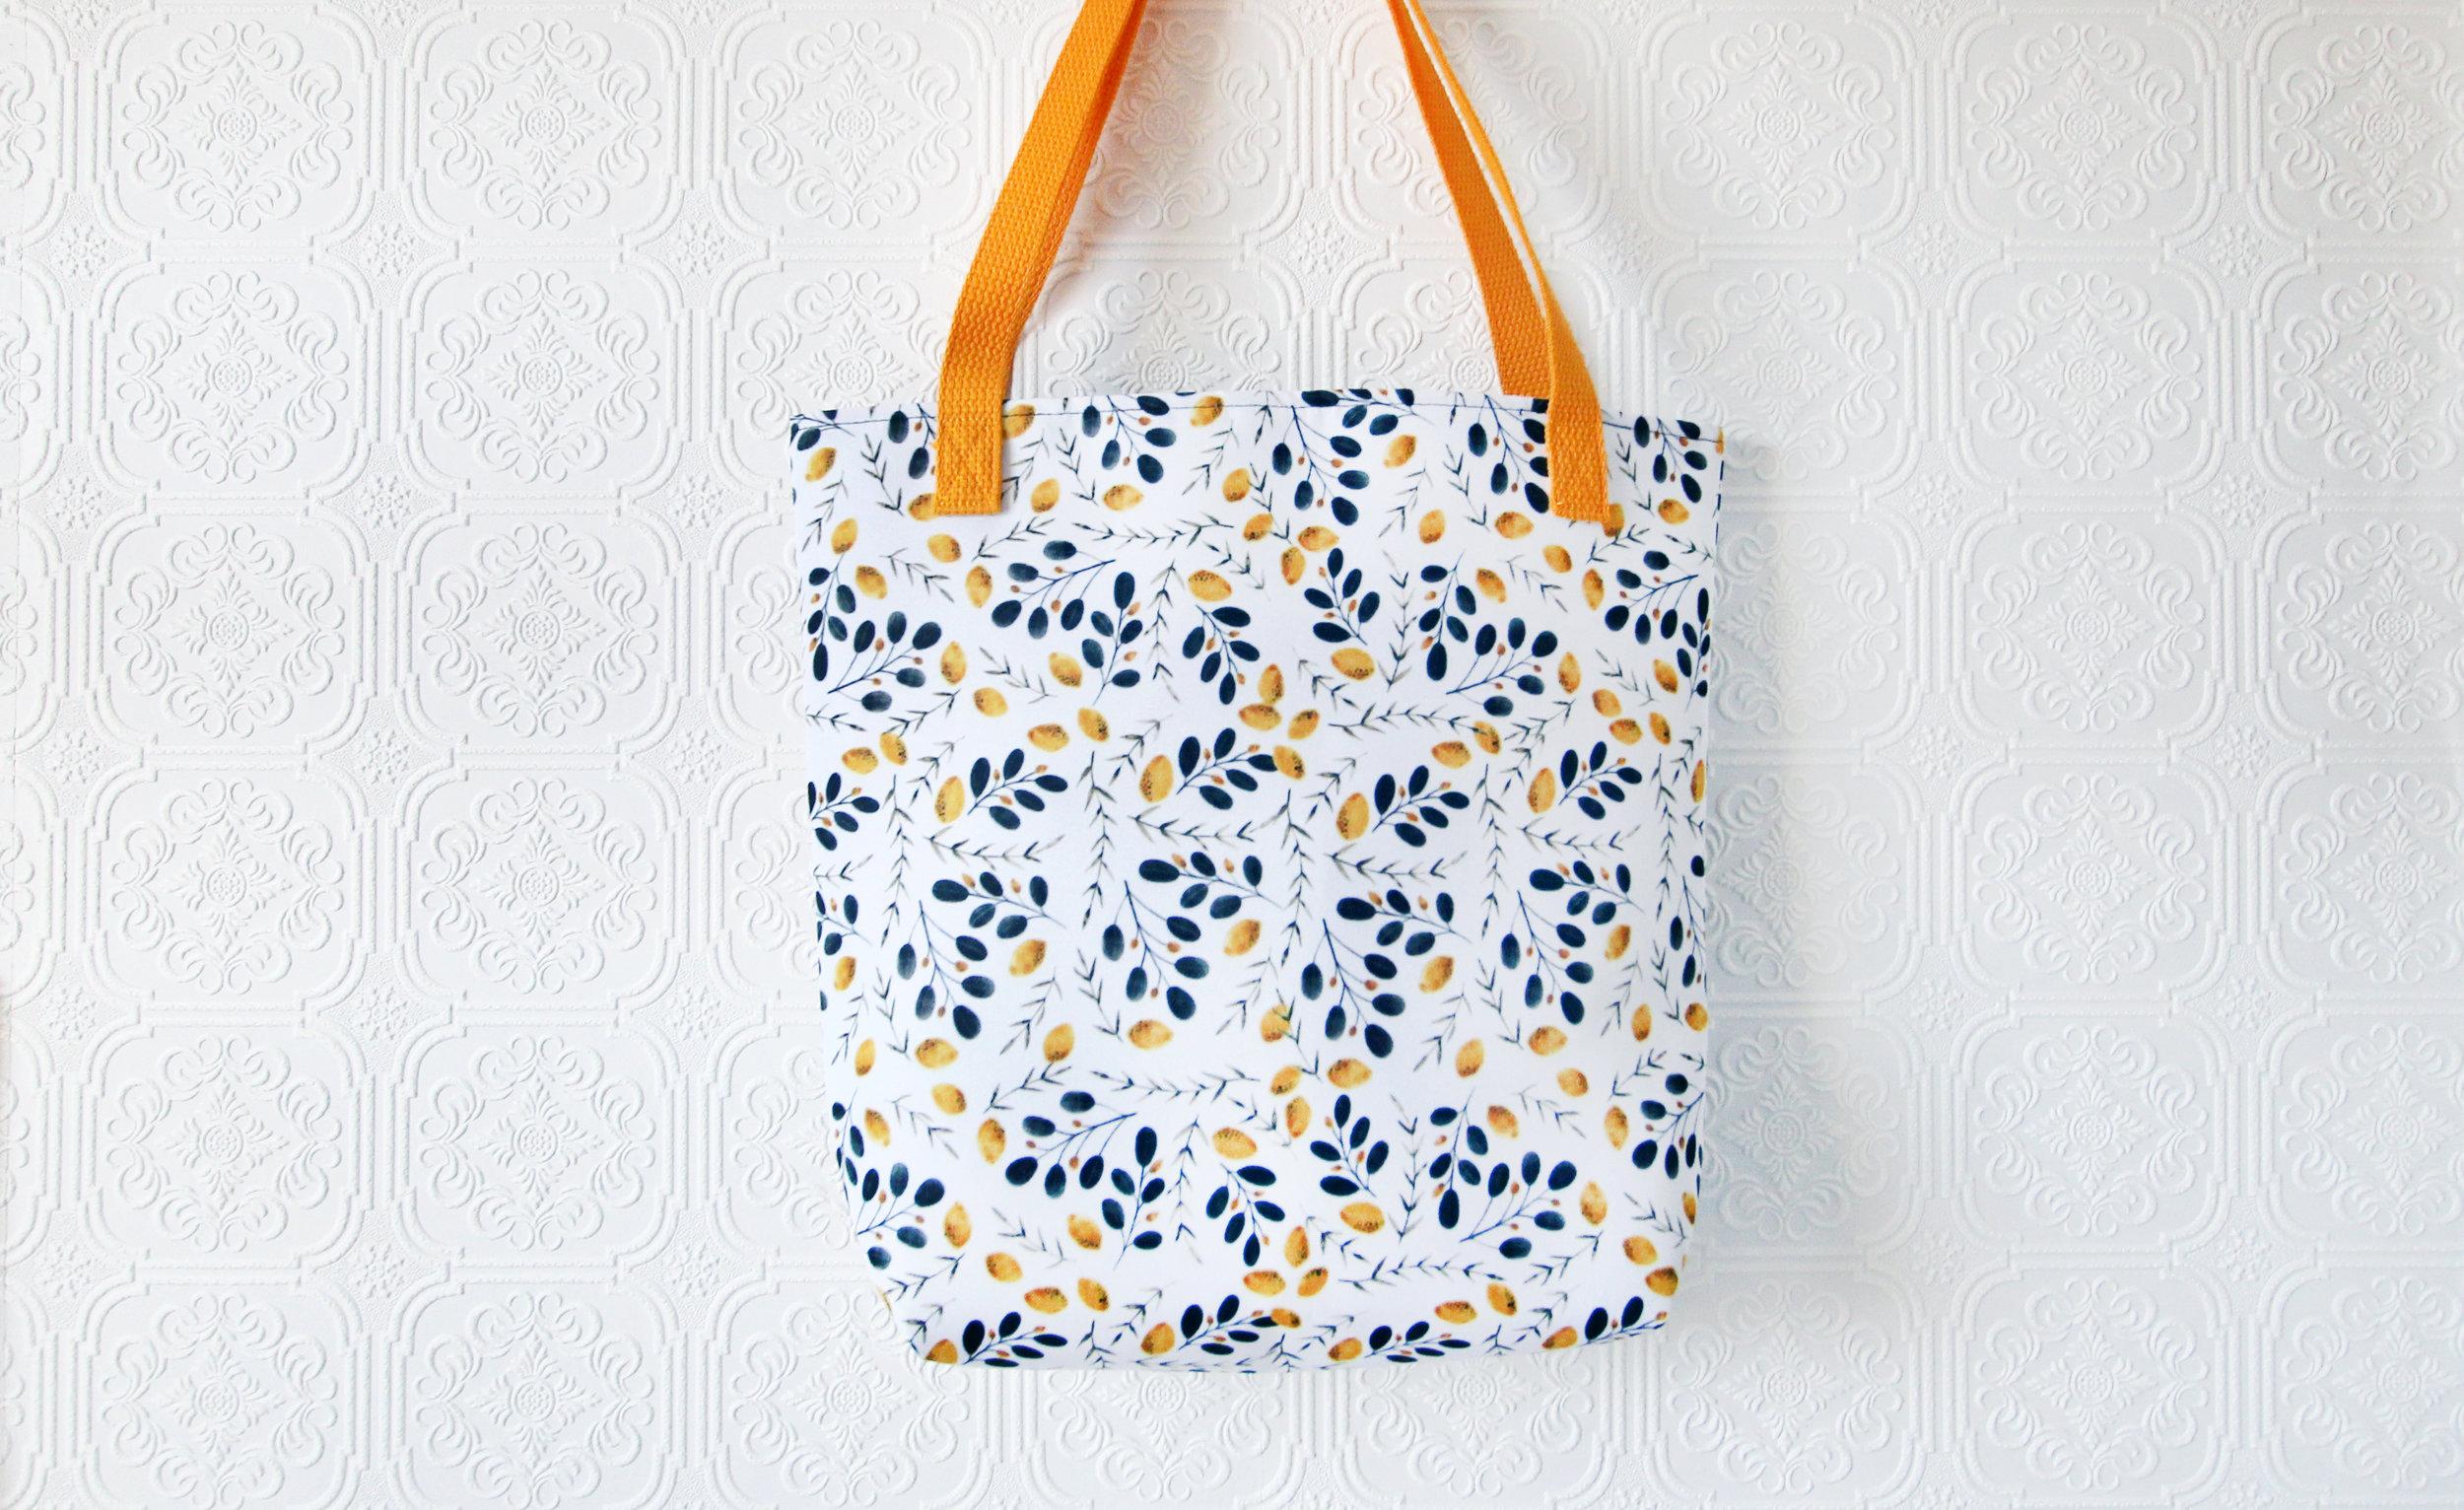 Maryclarewilkie-Lemons-3-Totesbag-marketbag-purse-watercolour.jpg